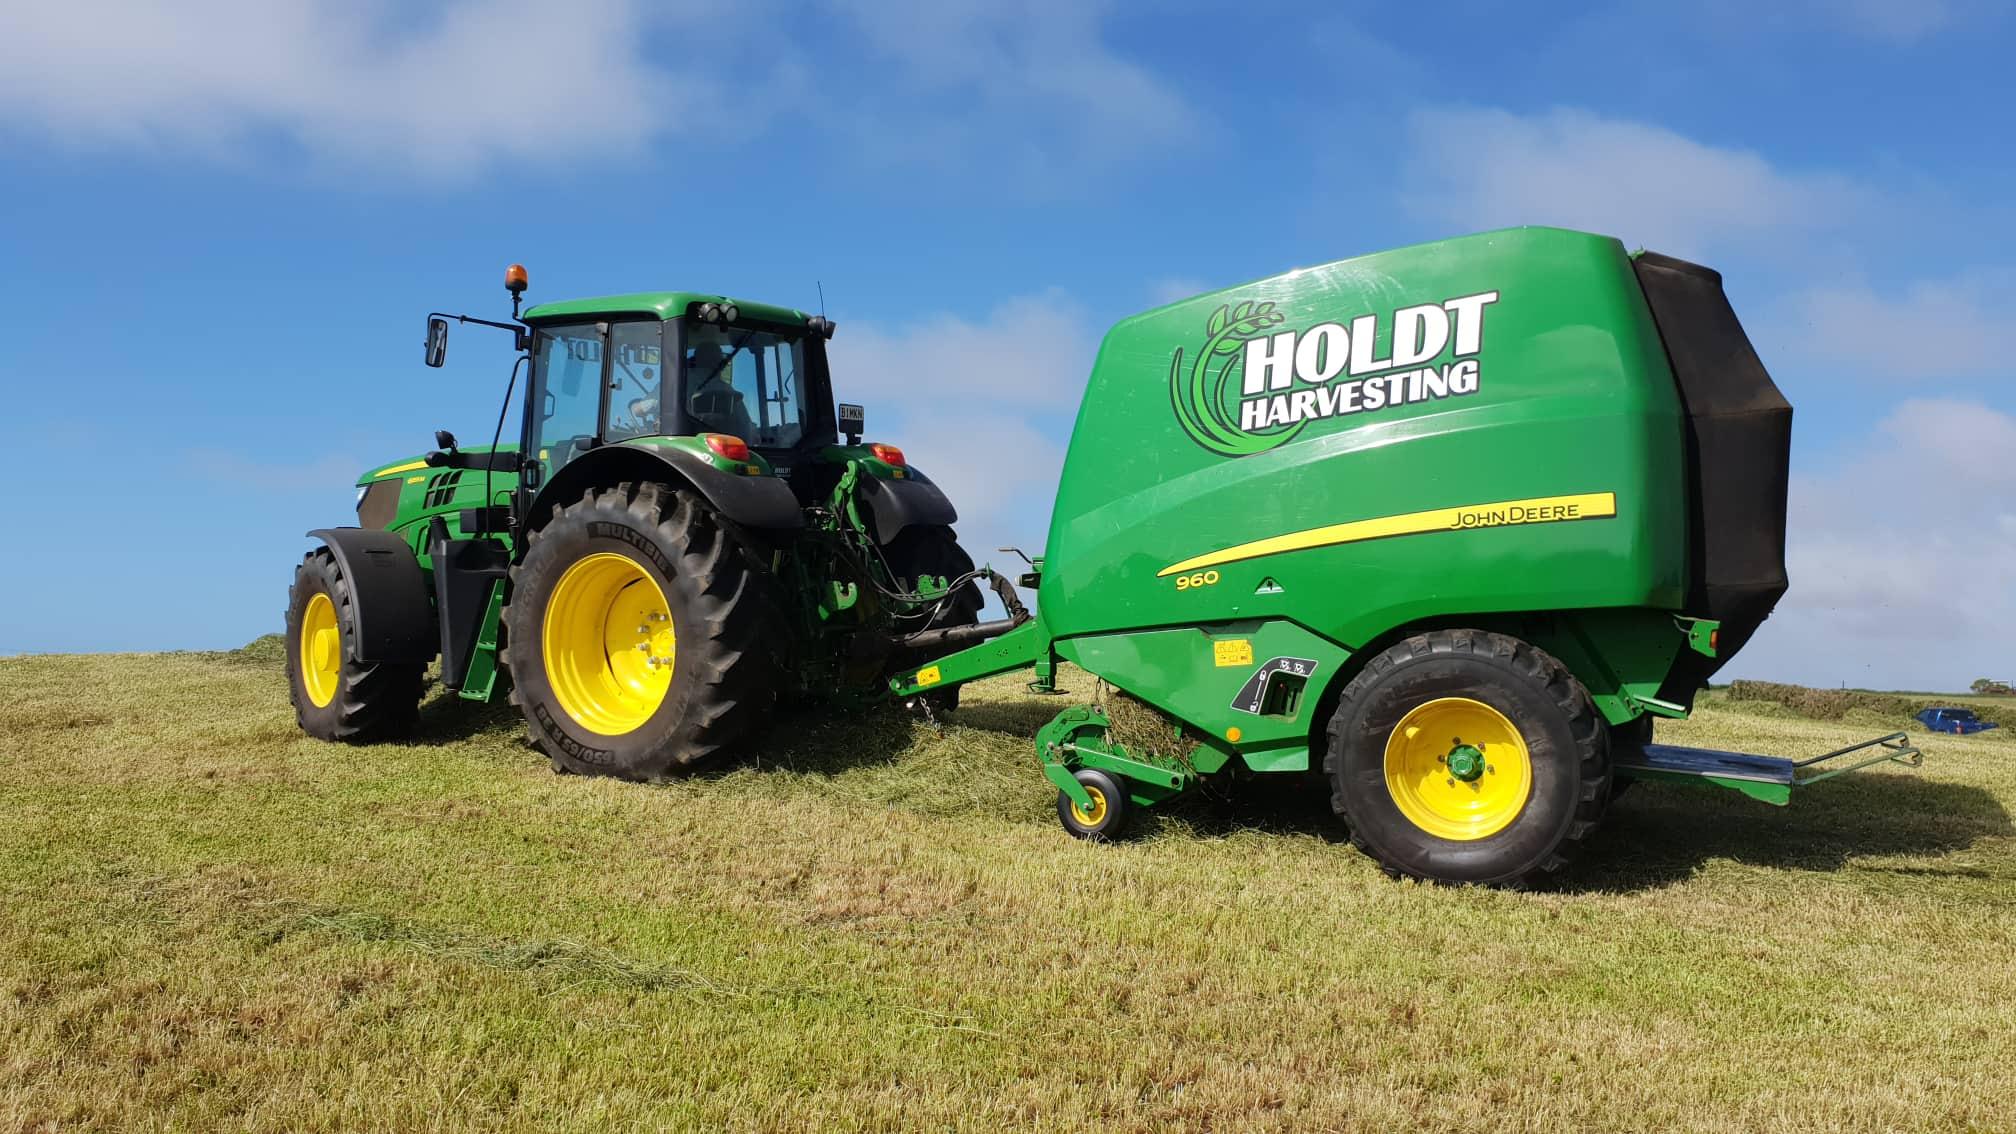 Holdt Harvesting